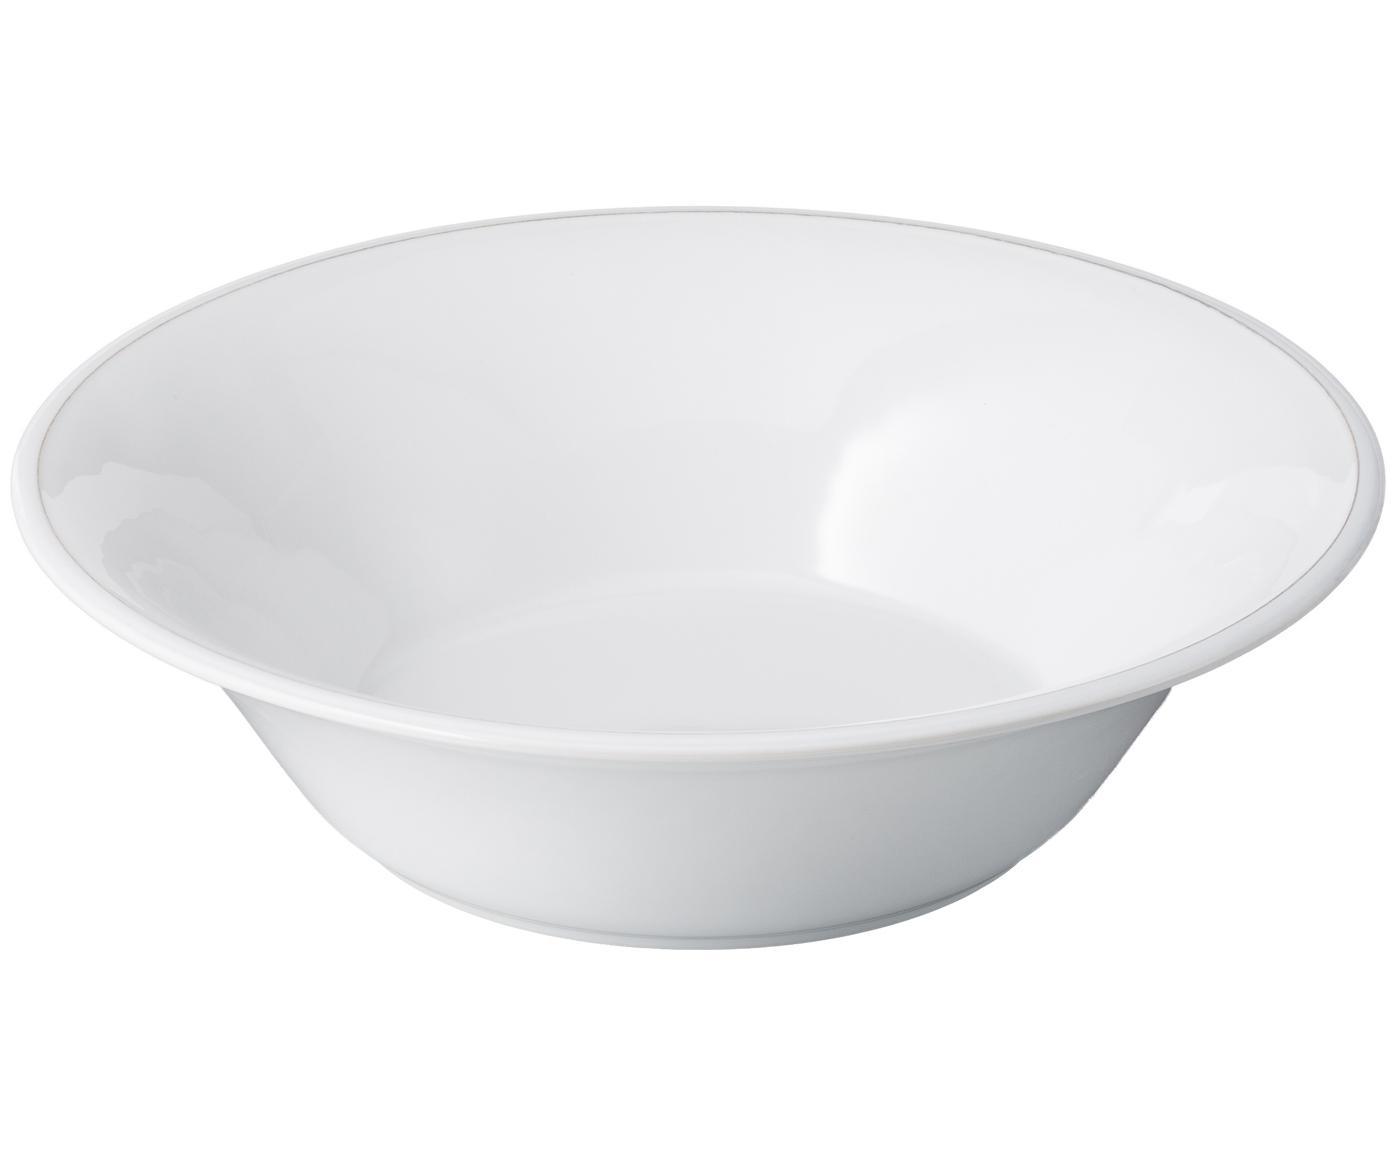 Insalatiera in bianco Constance, Ceramica, Bianco, Ø 30 x Alt. 9 cm